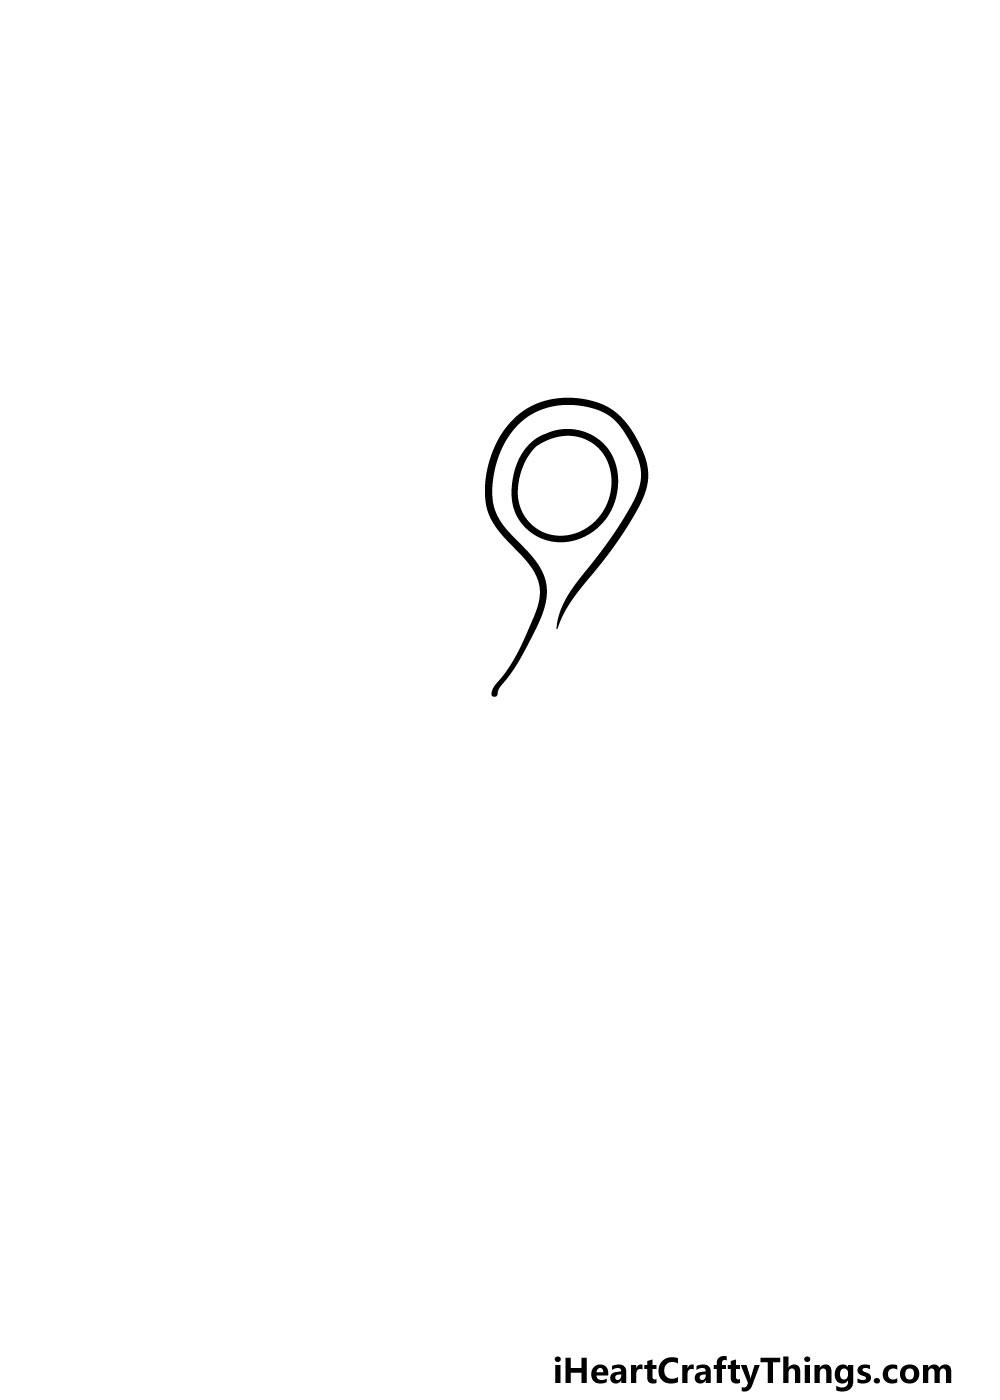 drawing scissors step 1